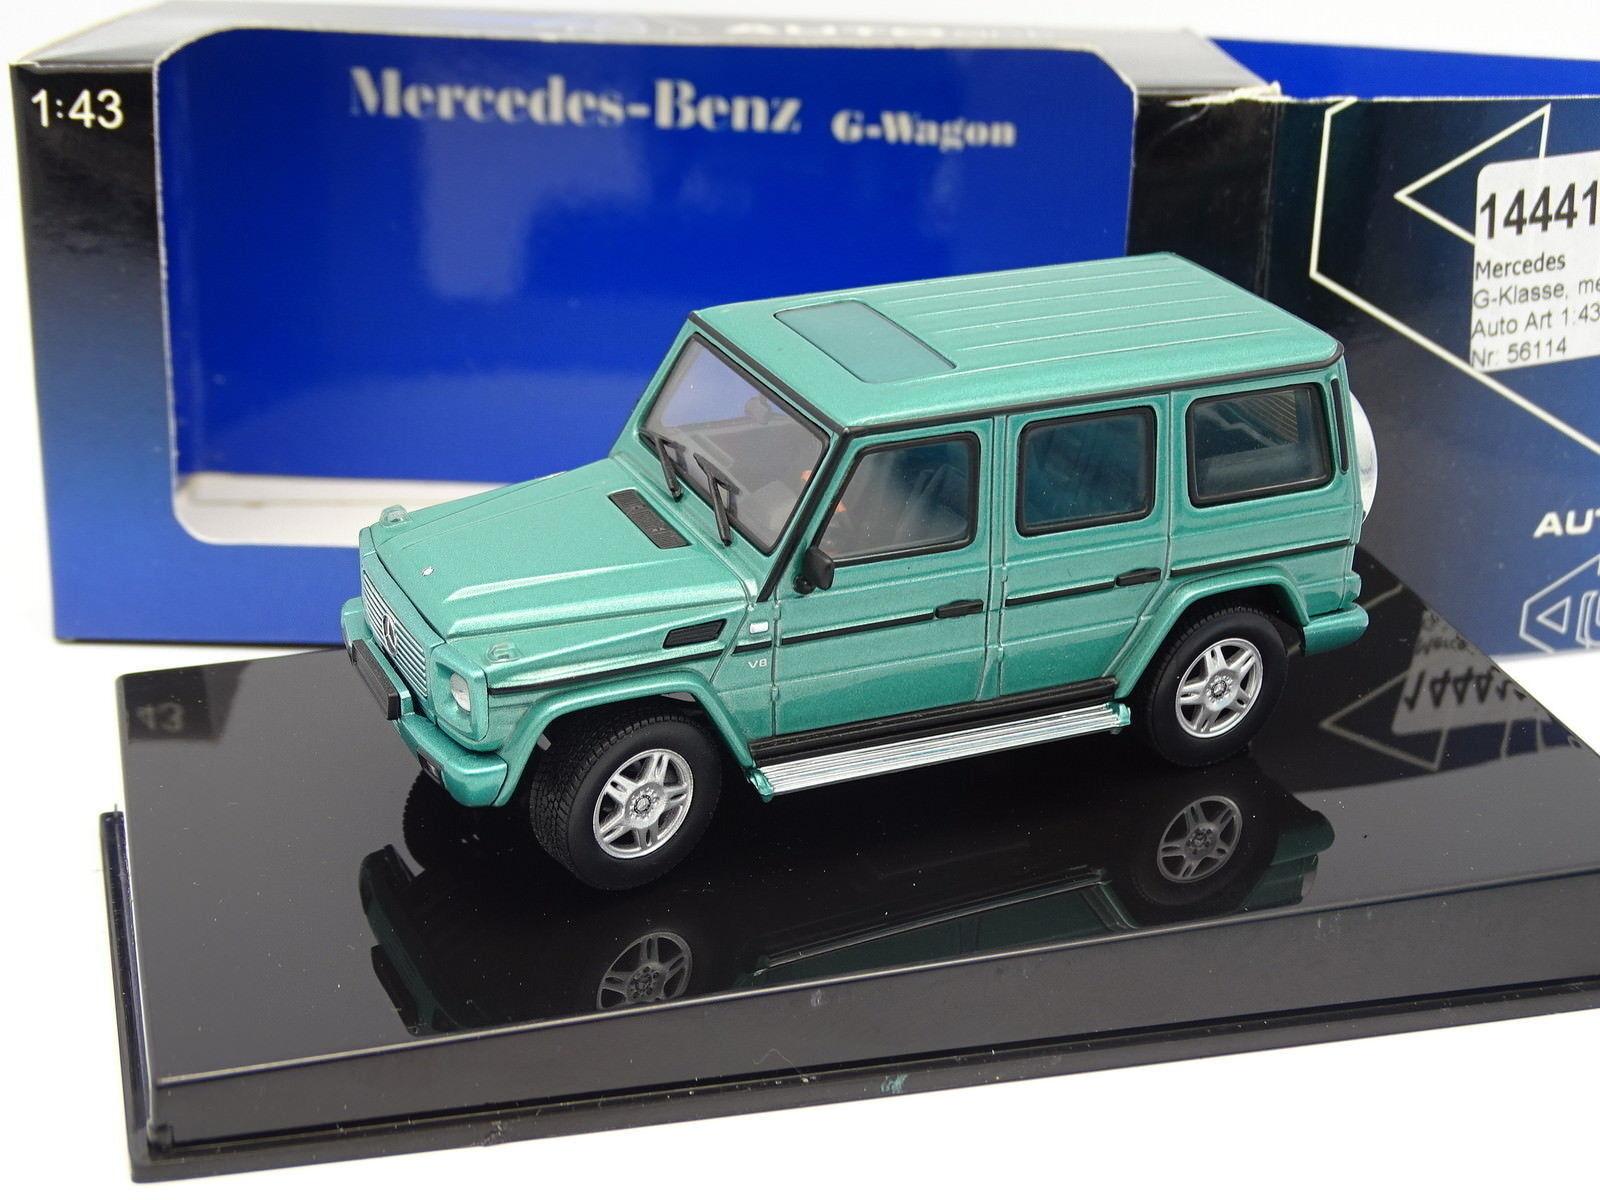 Auto Art 1 43 - Mercedes Classroom G 500 Green